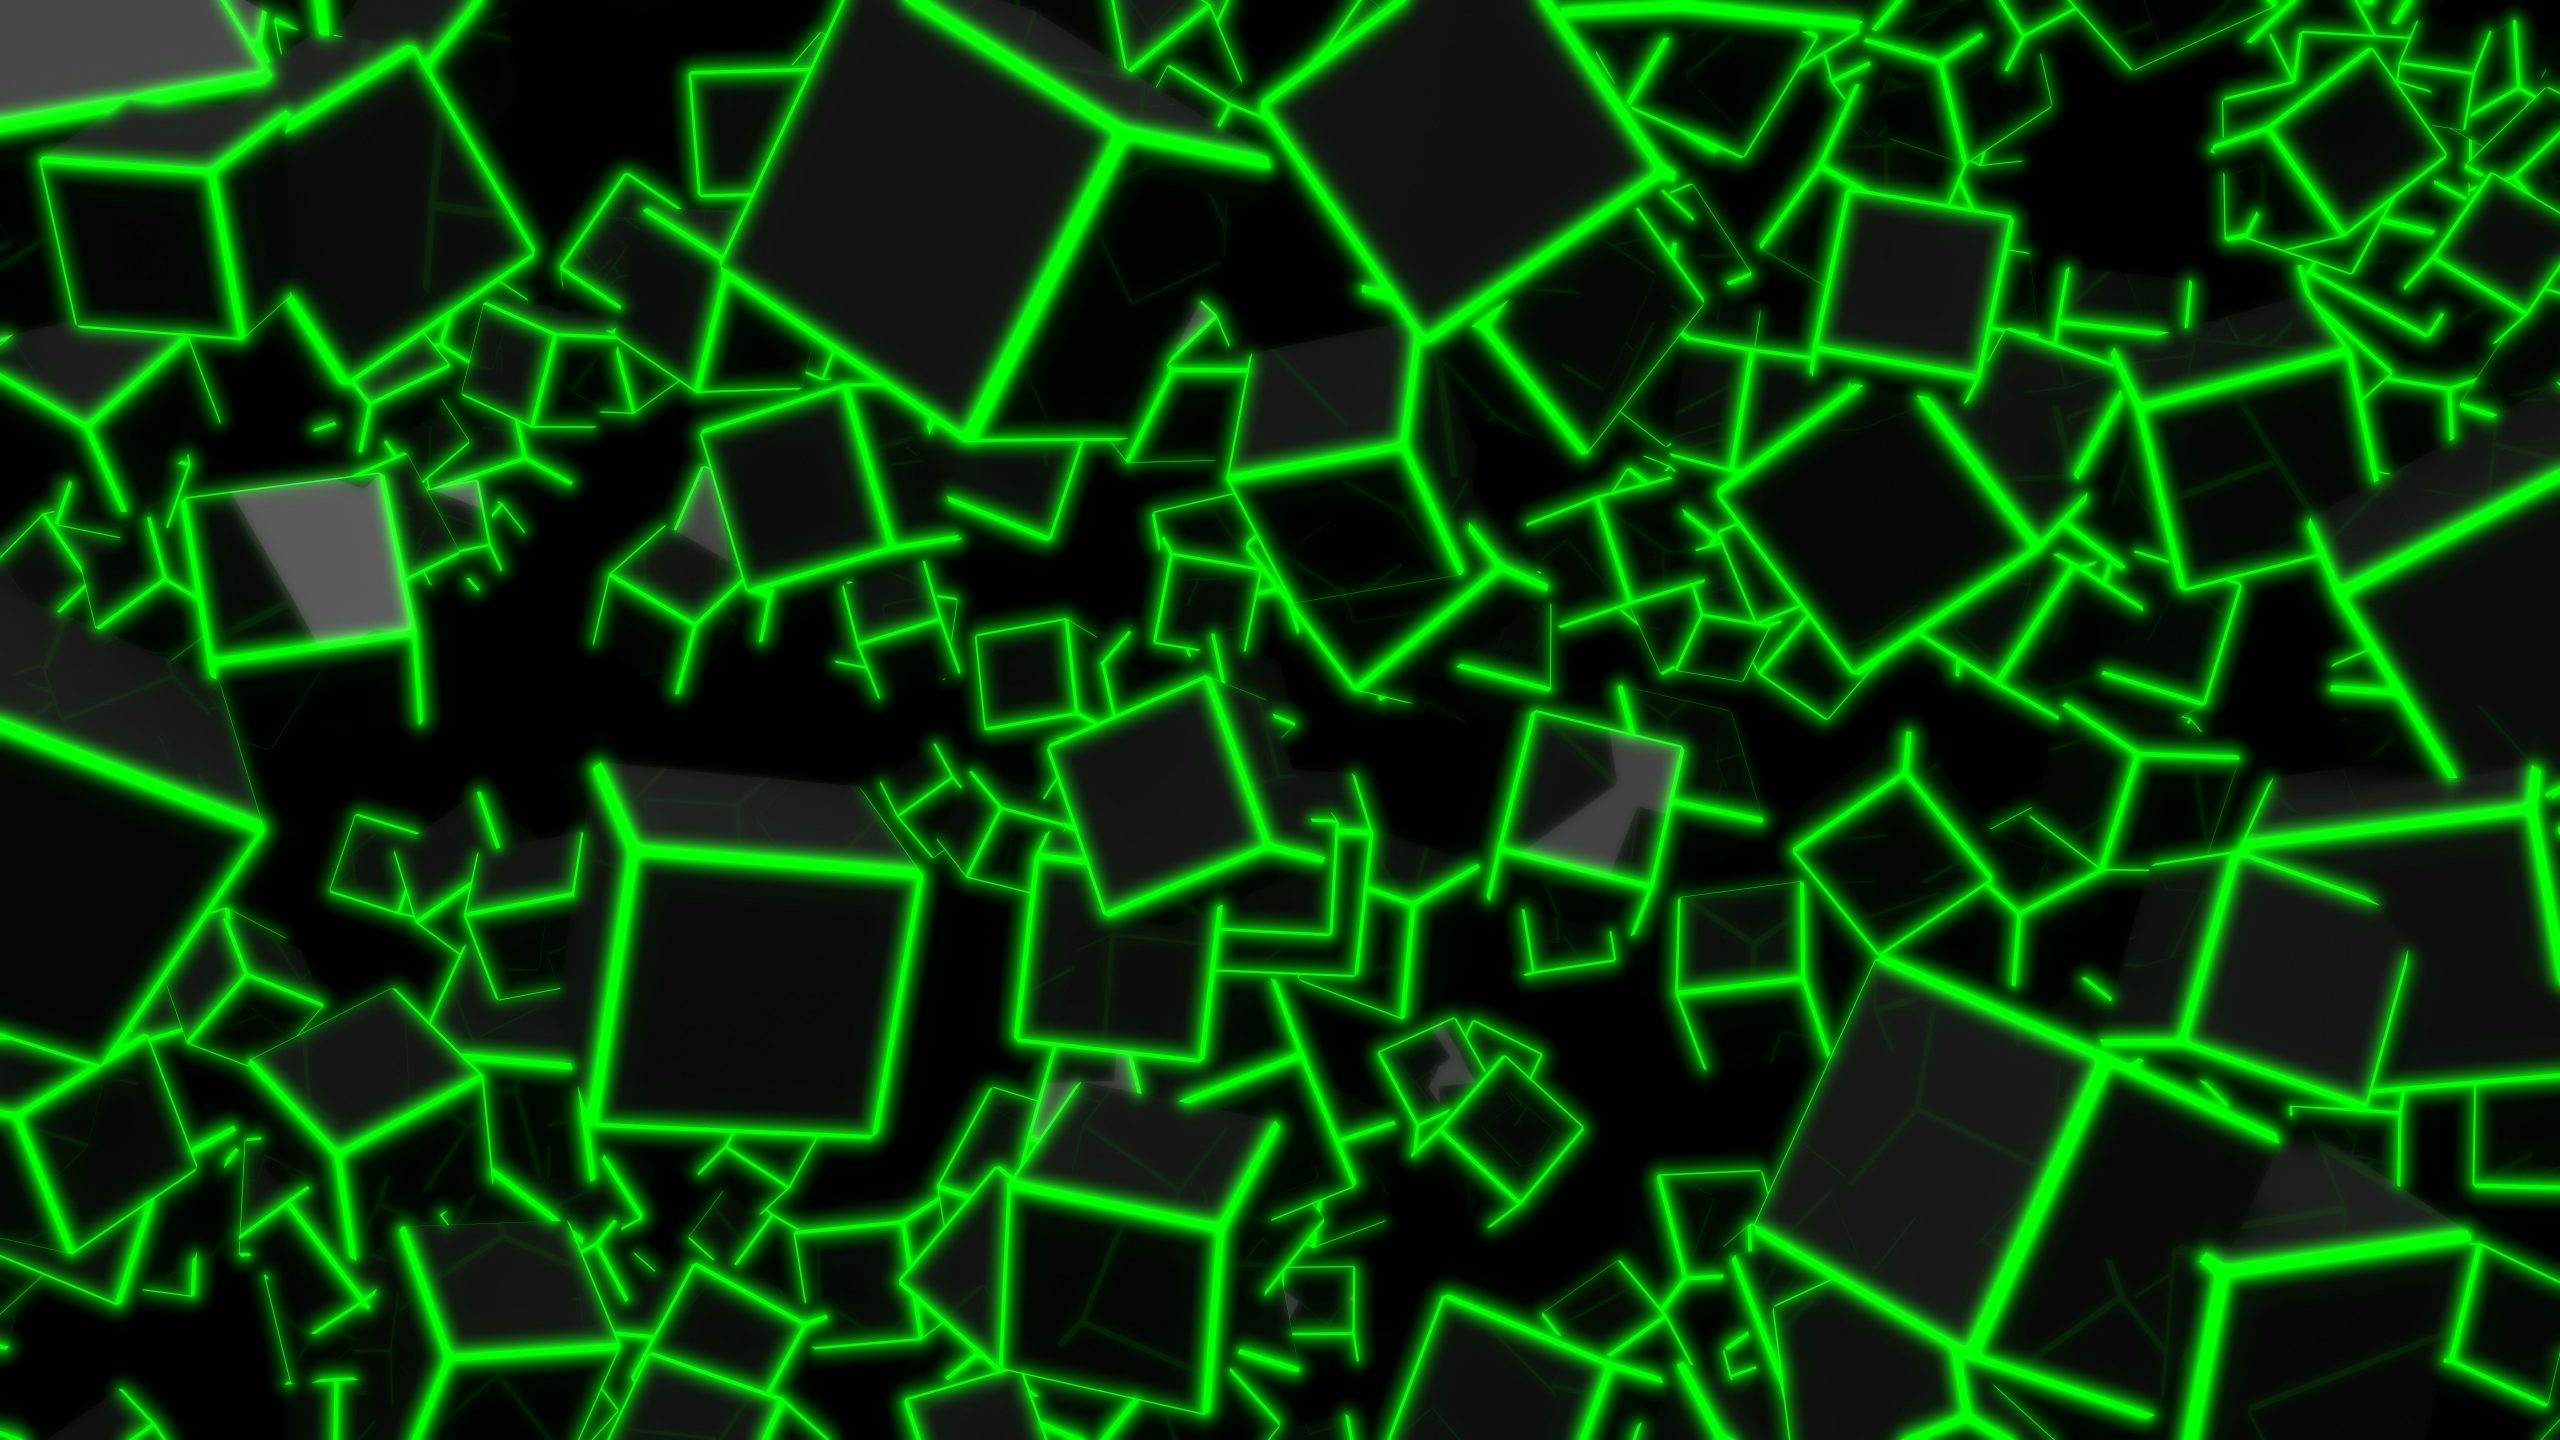 Green Neon Wallpaper (83+ images)